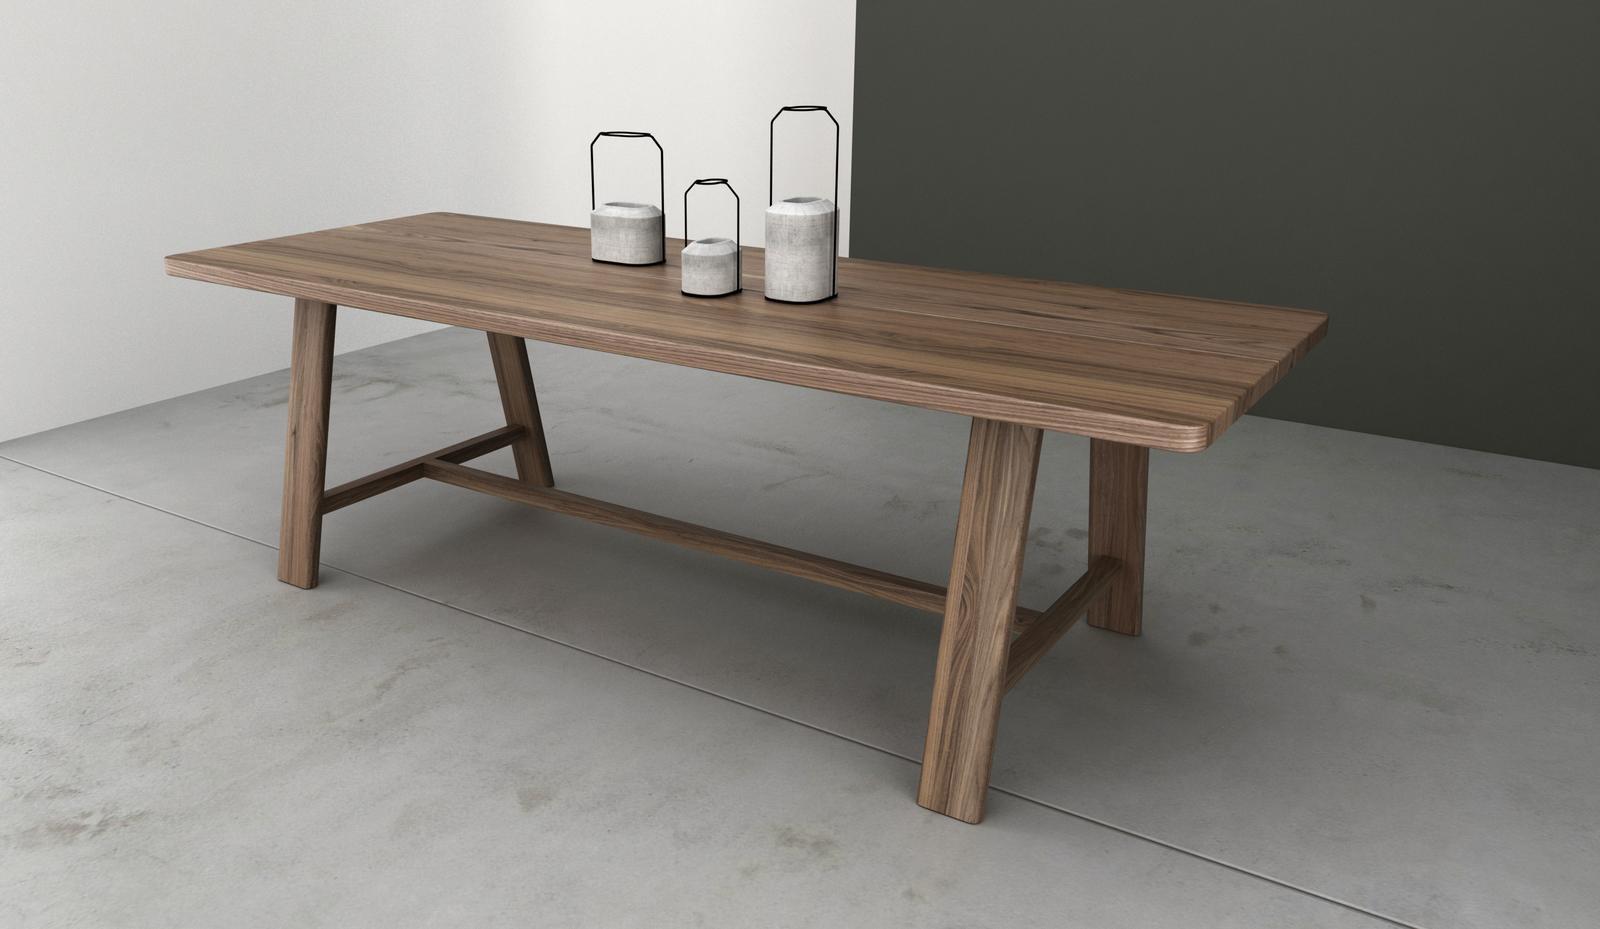 Jedálenský stôl FARM by Cubica - Jedálenský stôl FARM by Cubica - nohy v strede